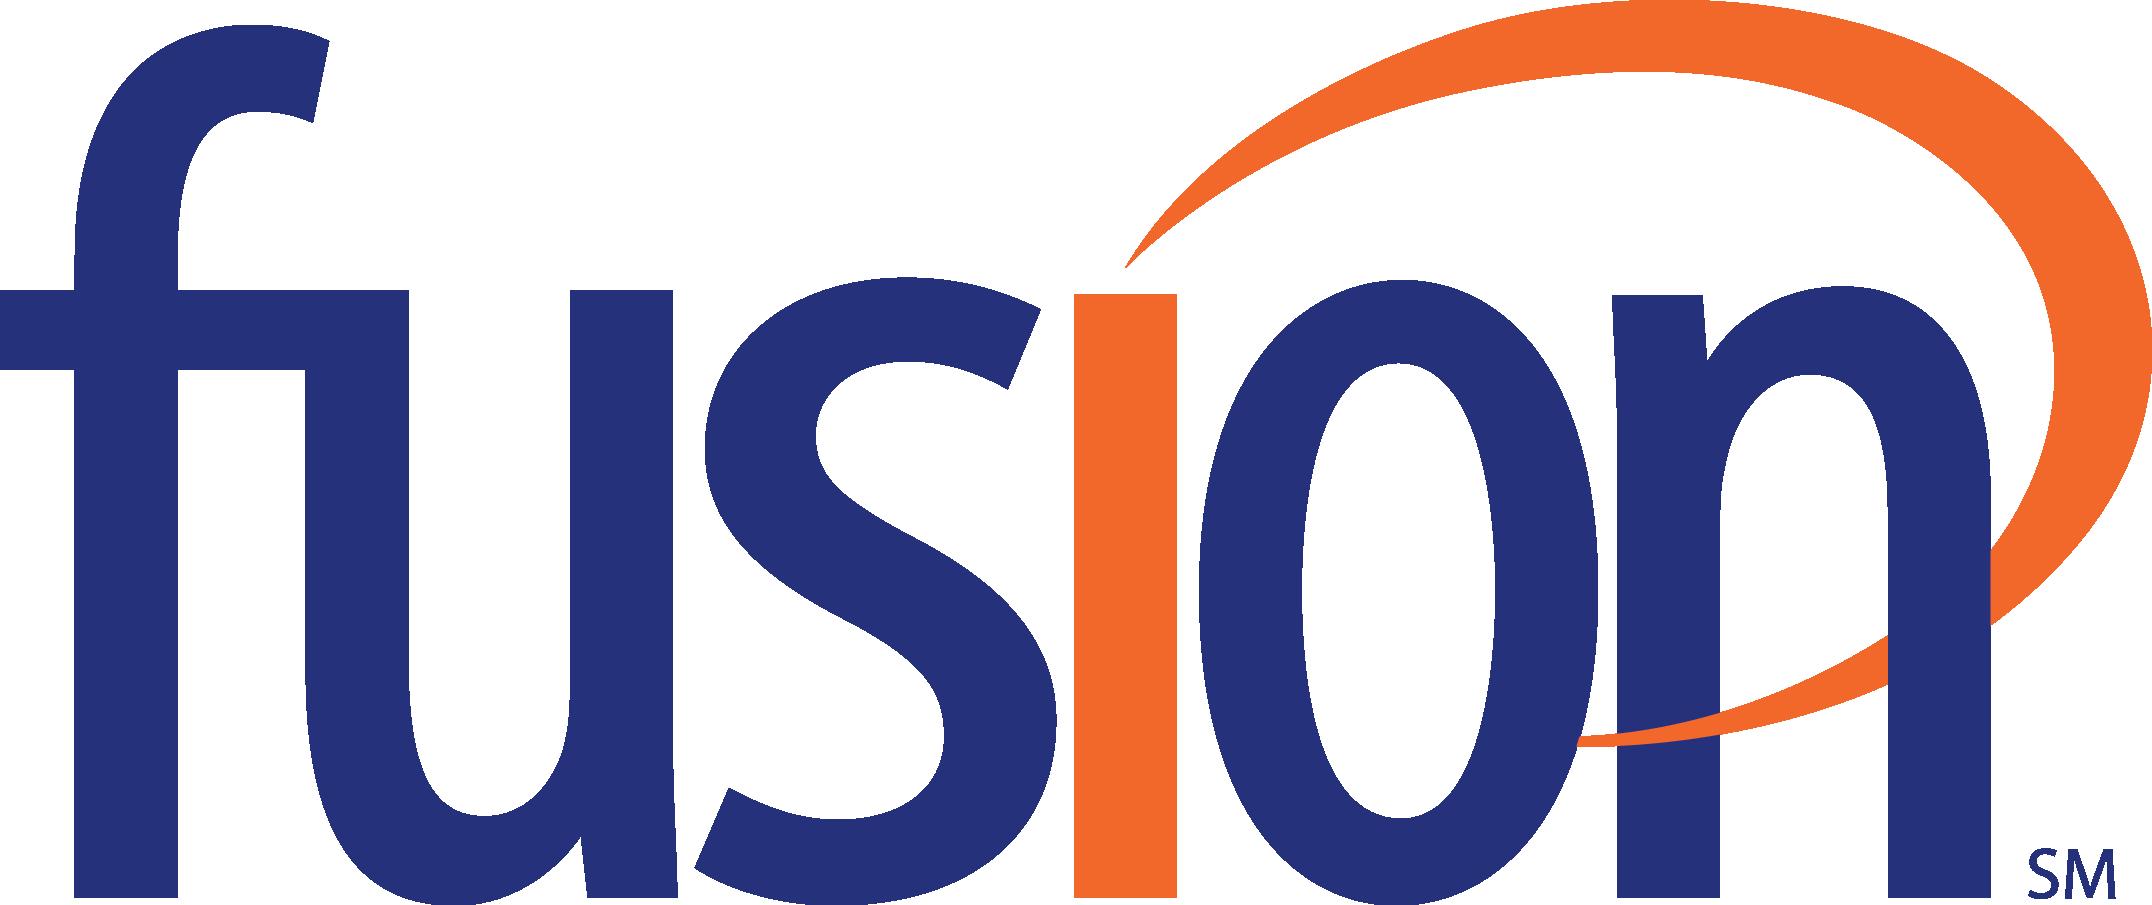 https://www.chasetek.com/wp-content/uploads/2018/02/fusion.png